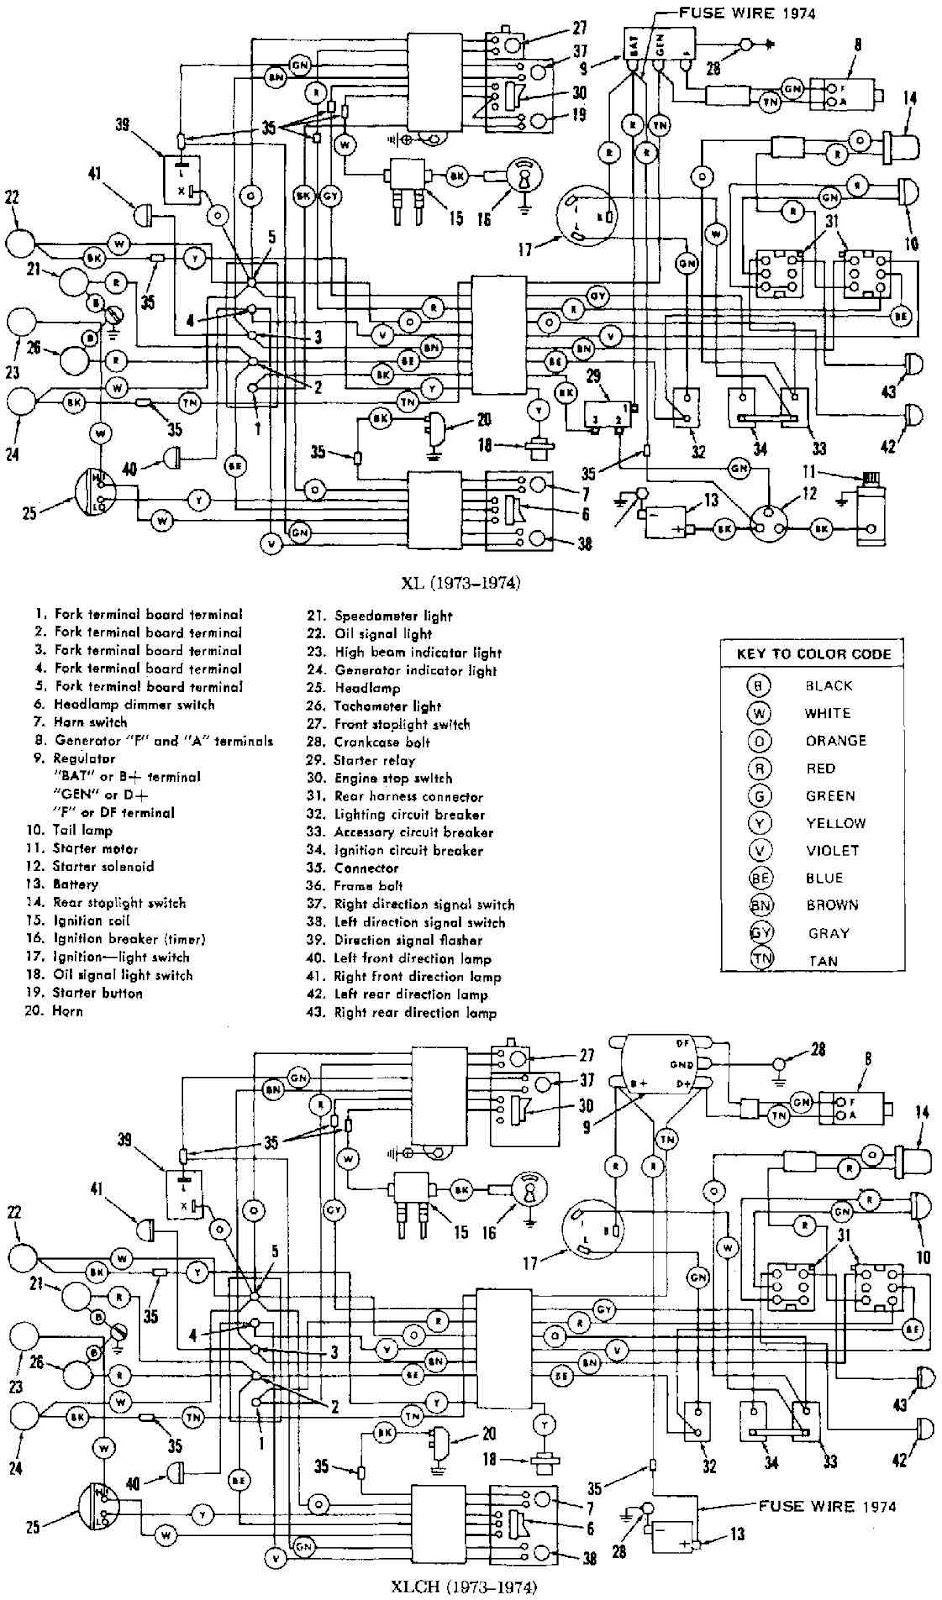 hight resolution of 2009 harley flh wiring diagram wiring library 1964 flh wiring diagram